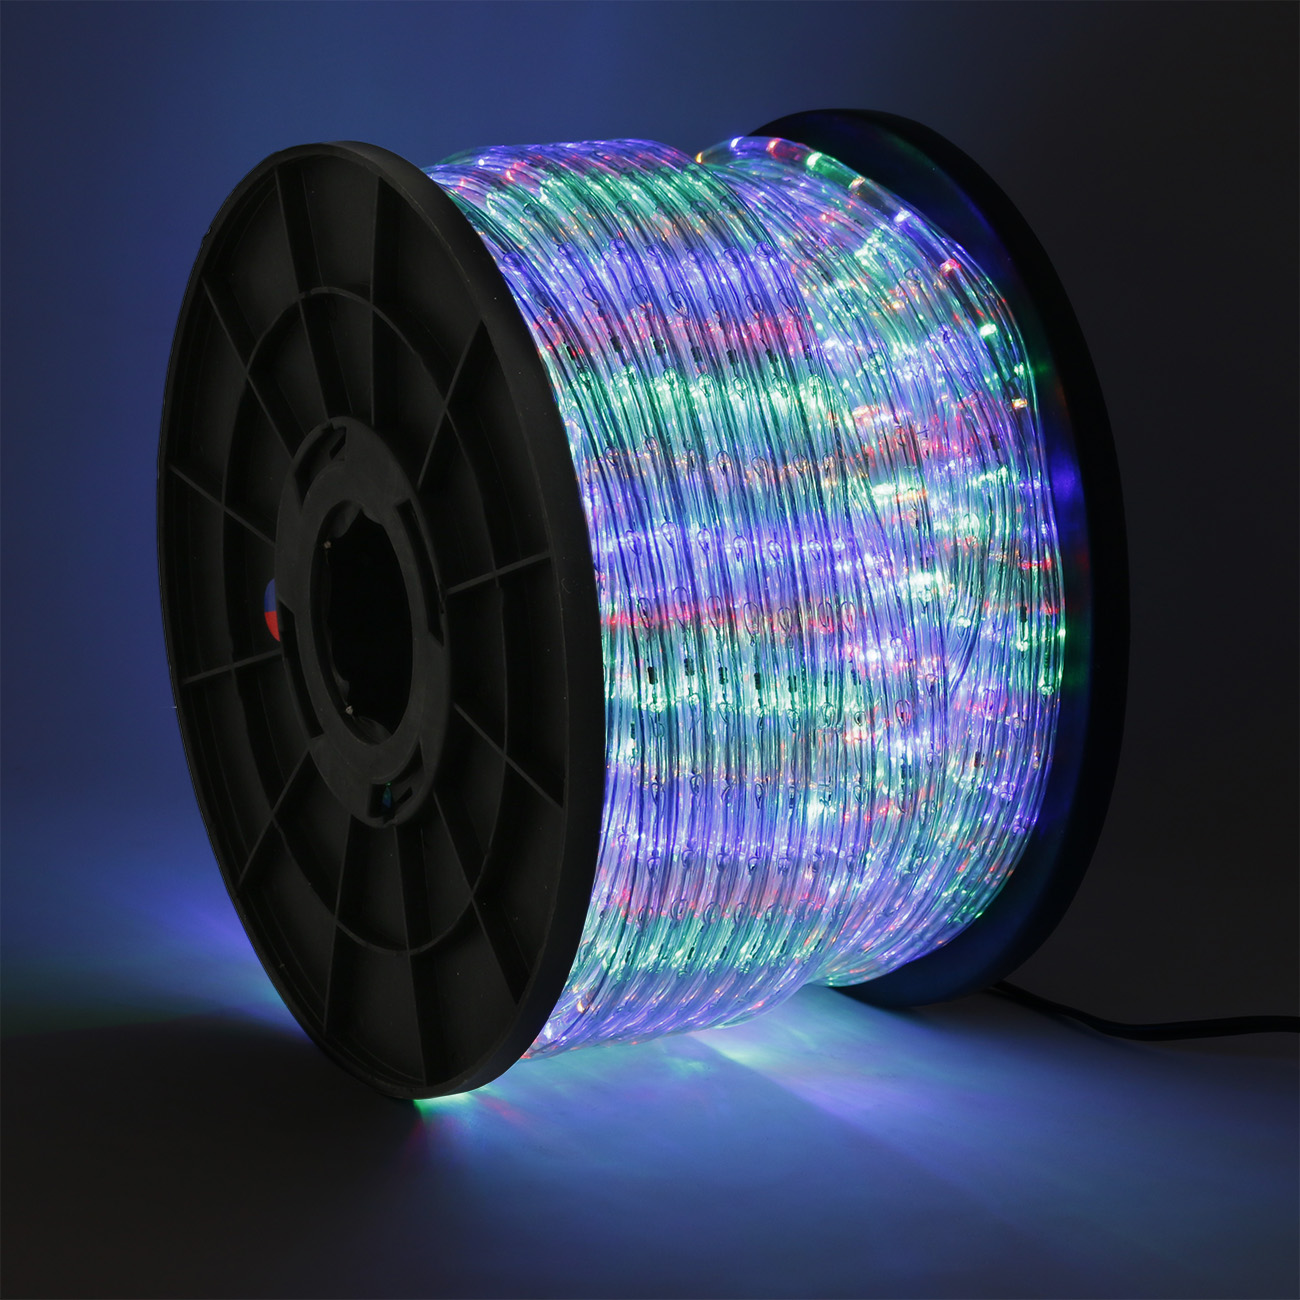 50 100 150 300ft led rope light 110v home party christmas for Led lights for outdoor lighting